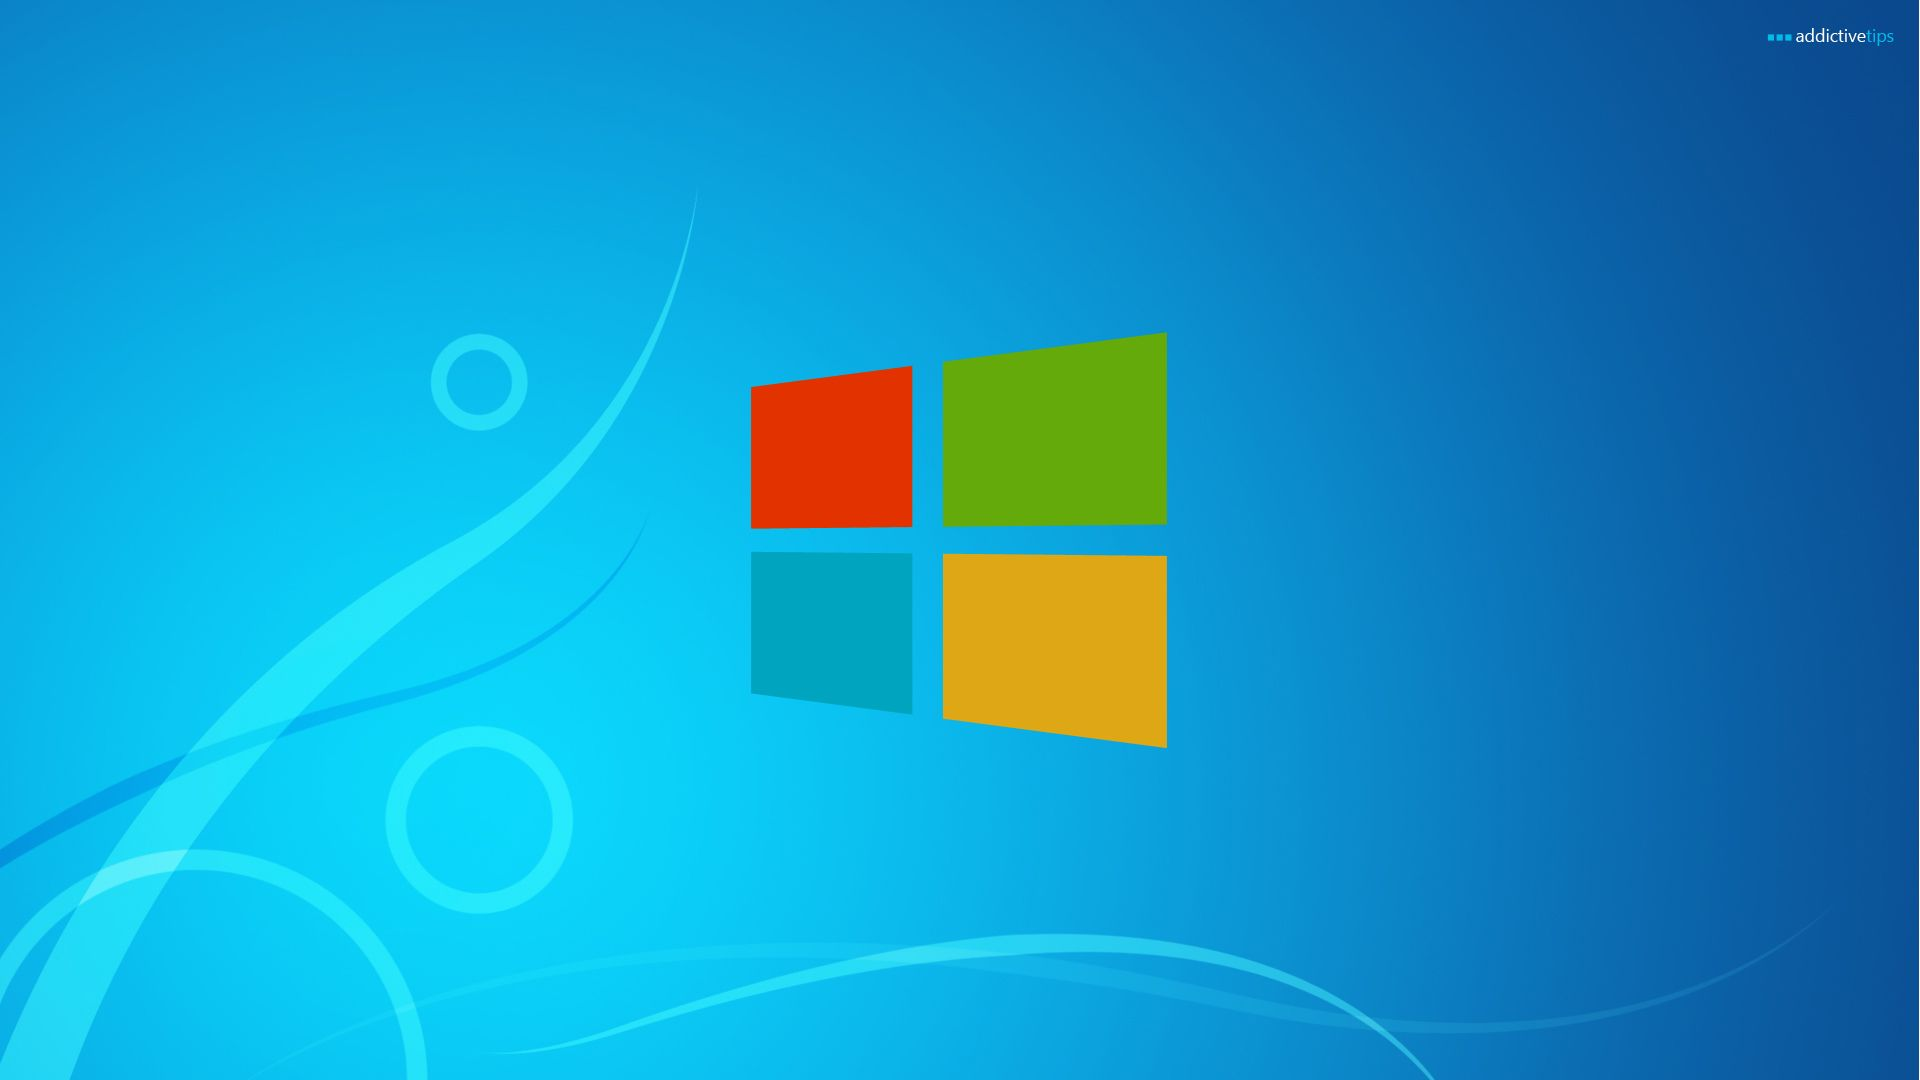 Windows 10 Hd Desktop Wallpaper Windows Wallpaper Windows Desktop Wallpaper Microsoft Wallpaper